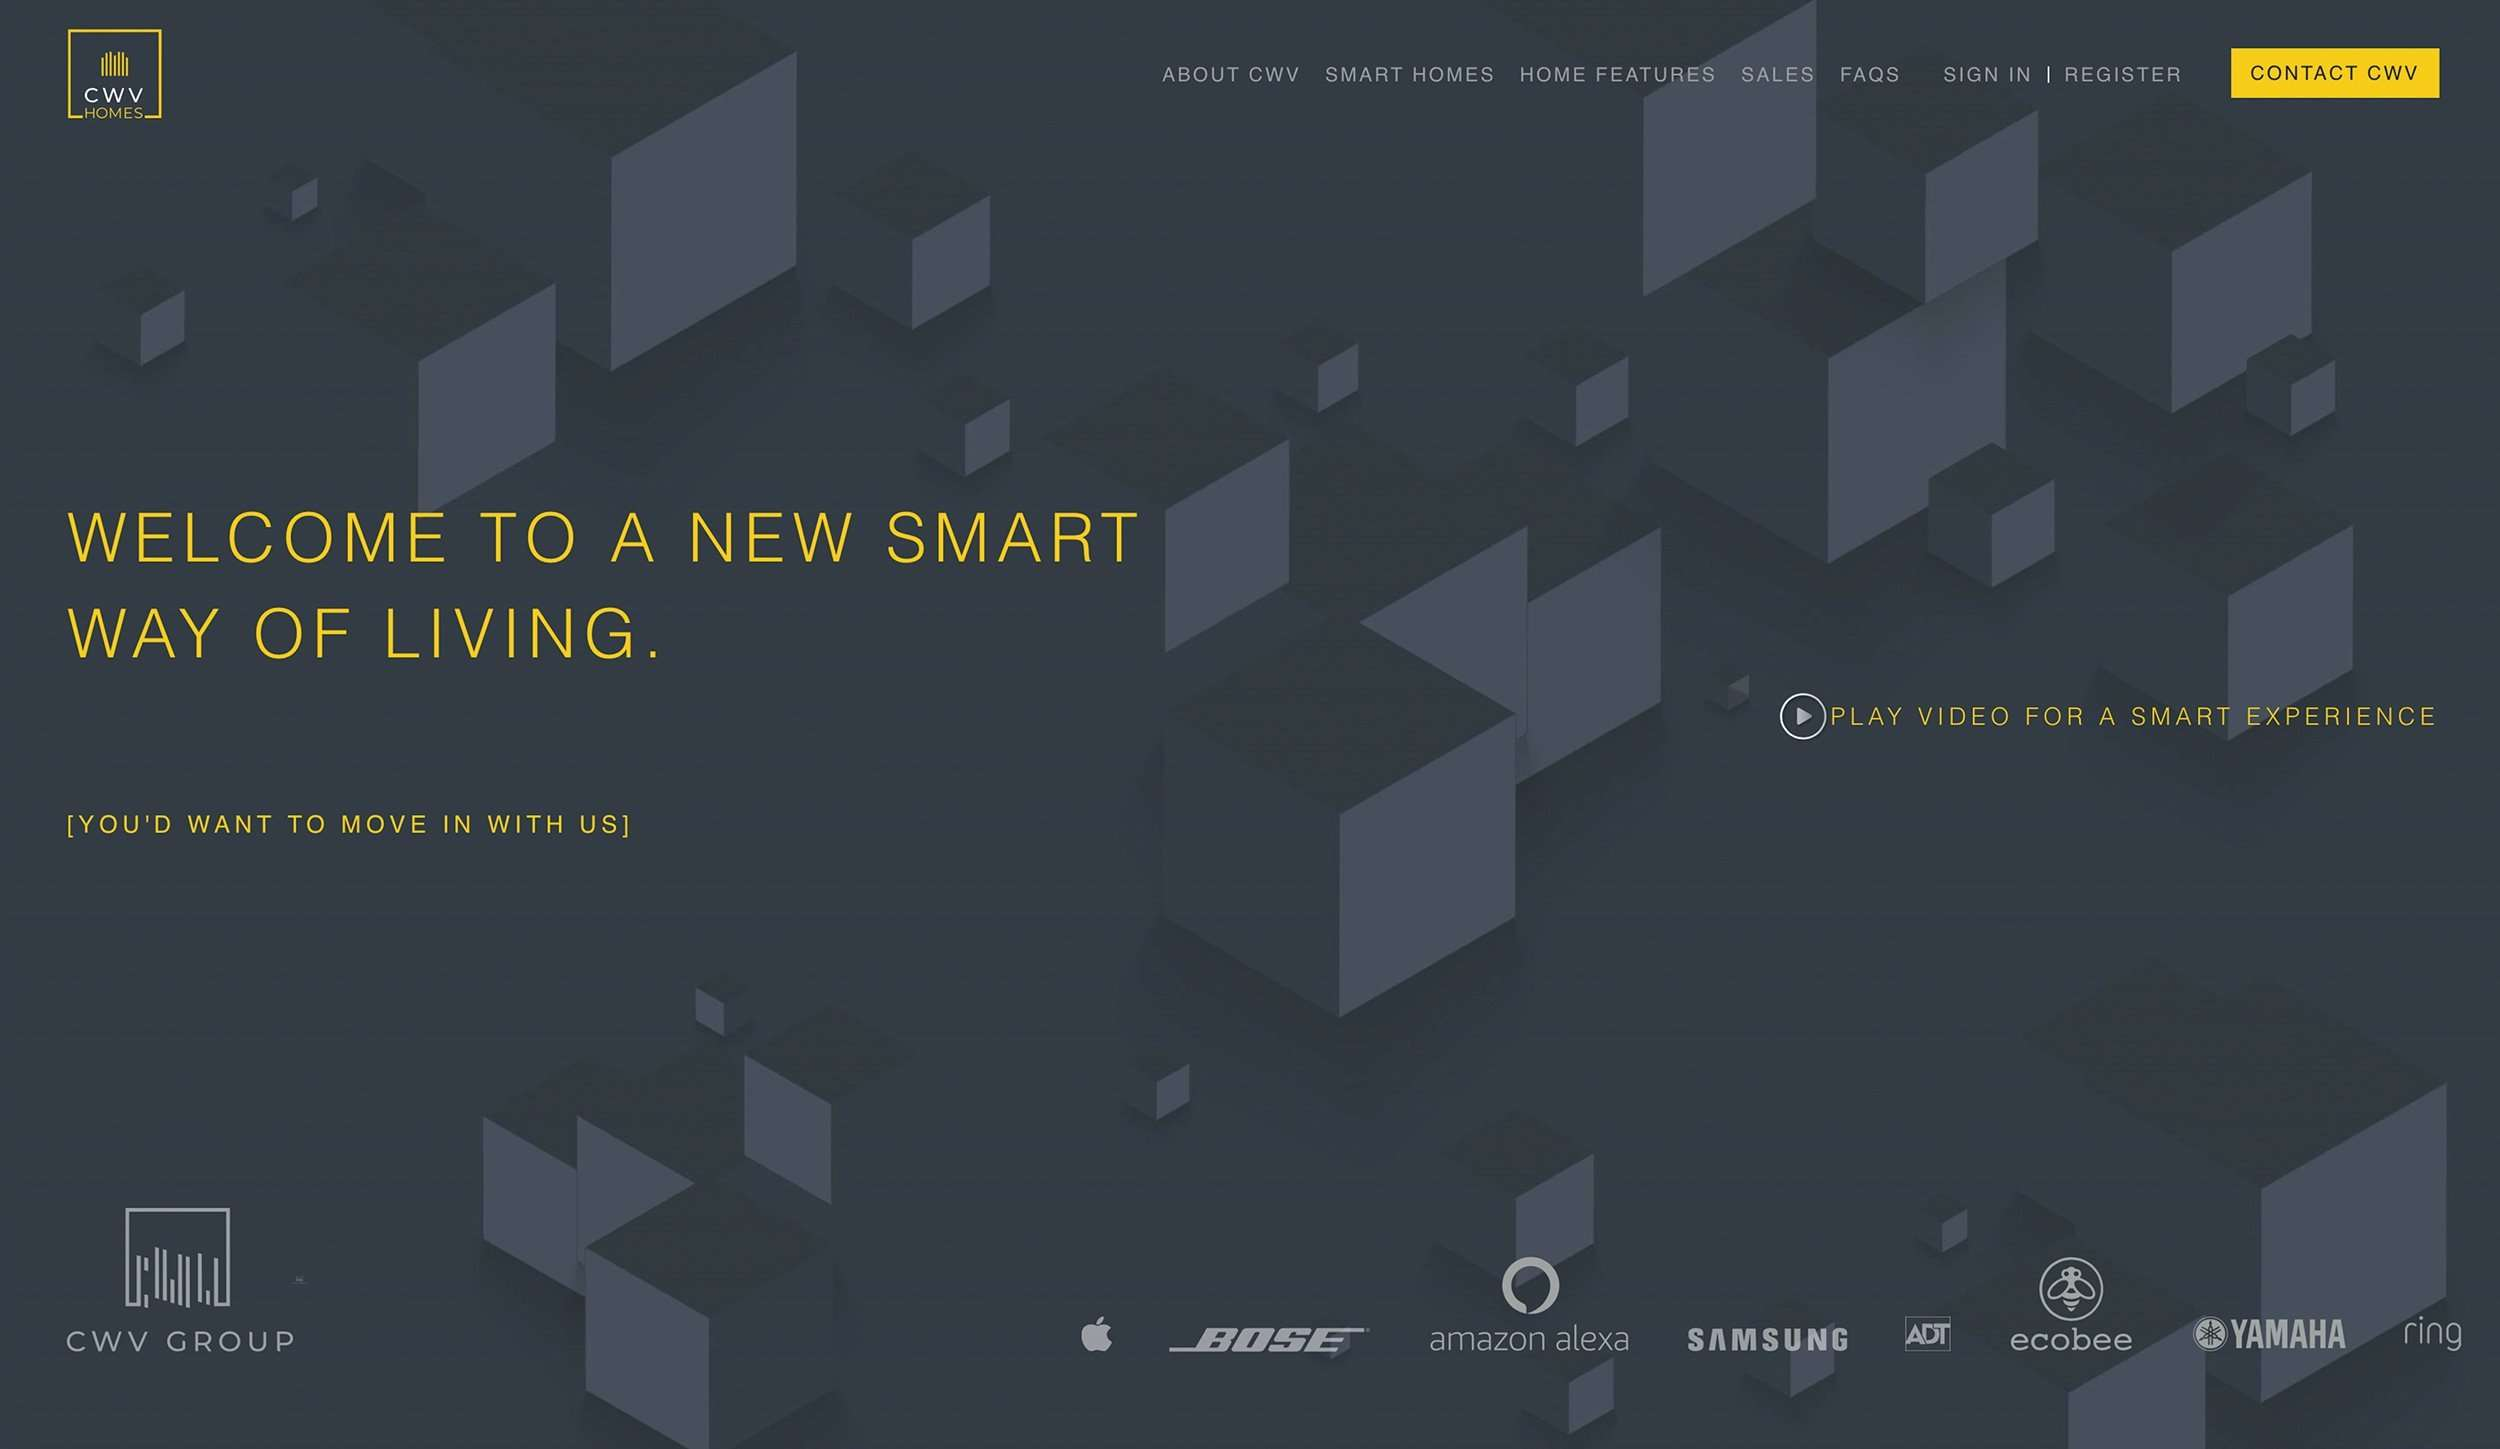 cwv-group-miami-usa-estados-unidos-real-estate-online-lab-lisbon-web-development-web-design-14